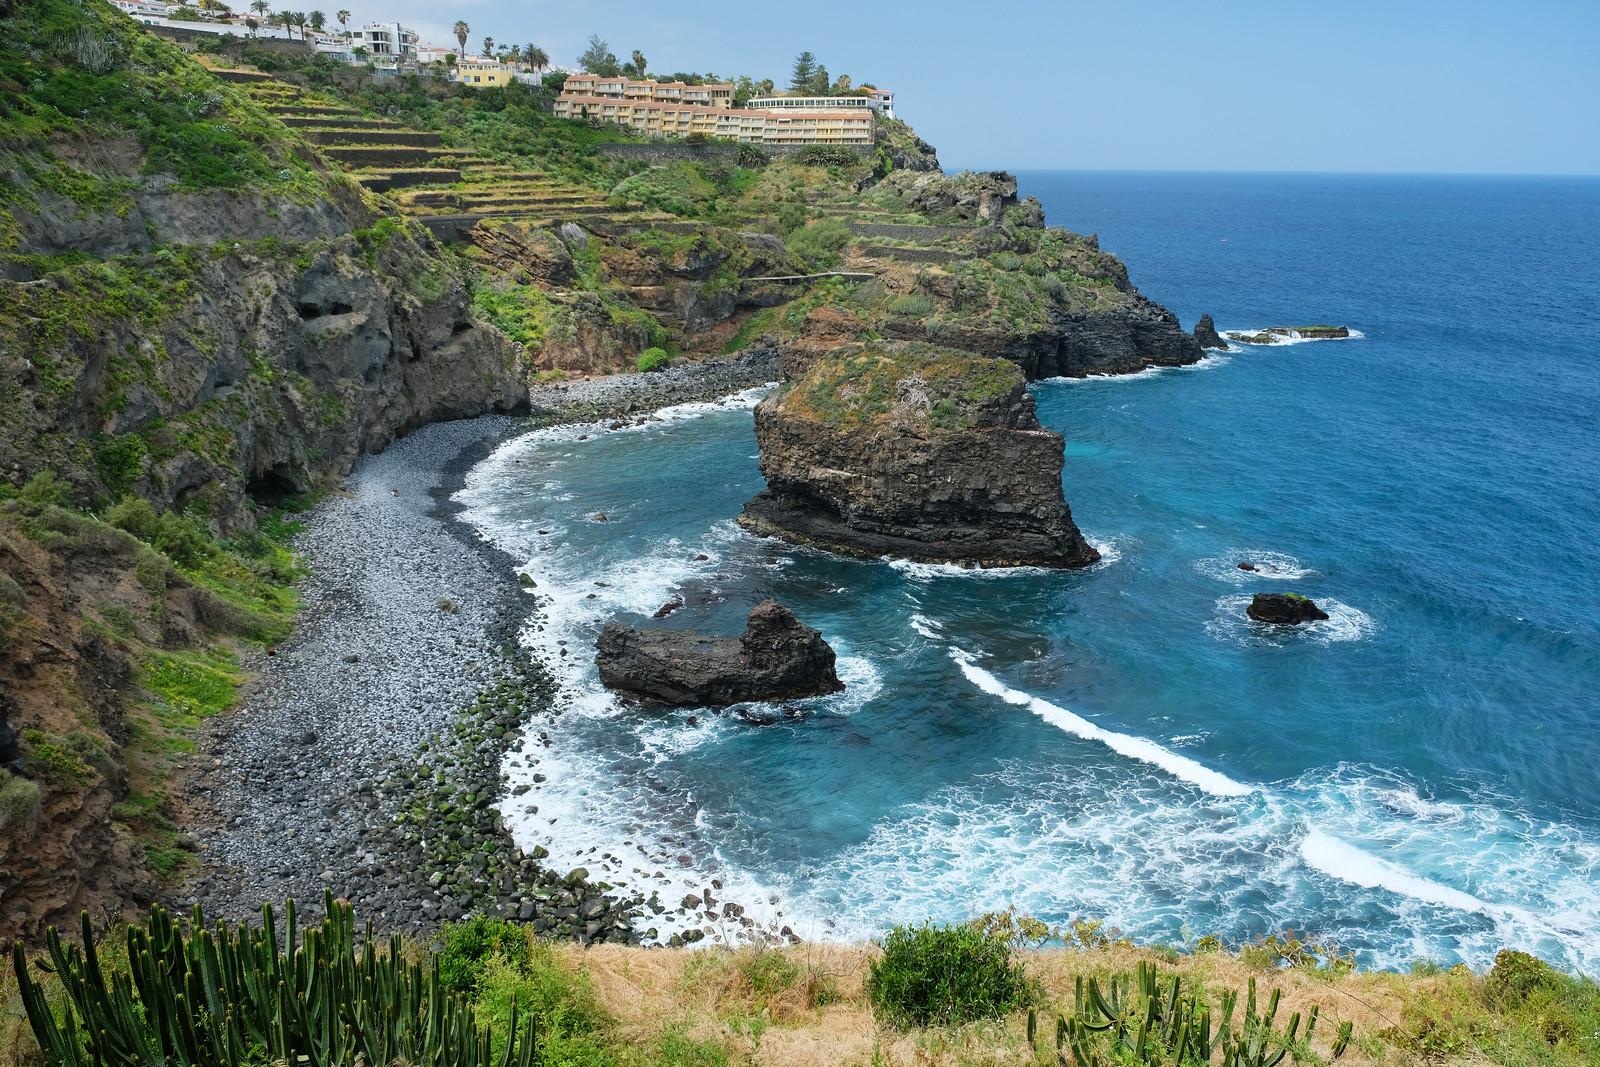 Playa de los Roques, Tenerife, Canary Islands, Spain